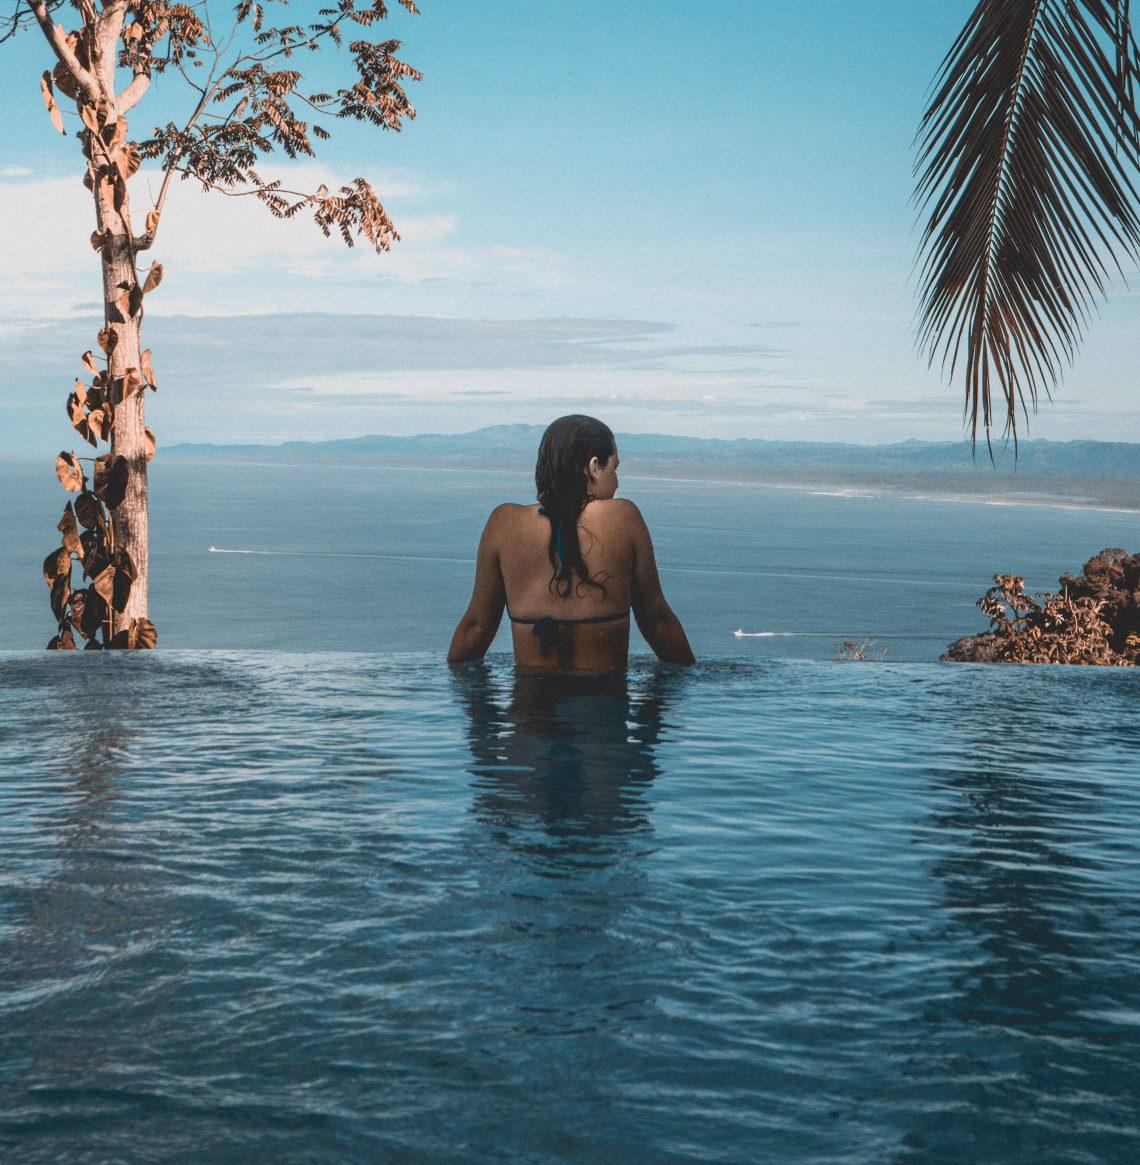 woman sitting in water